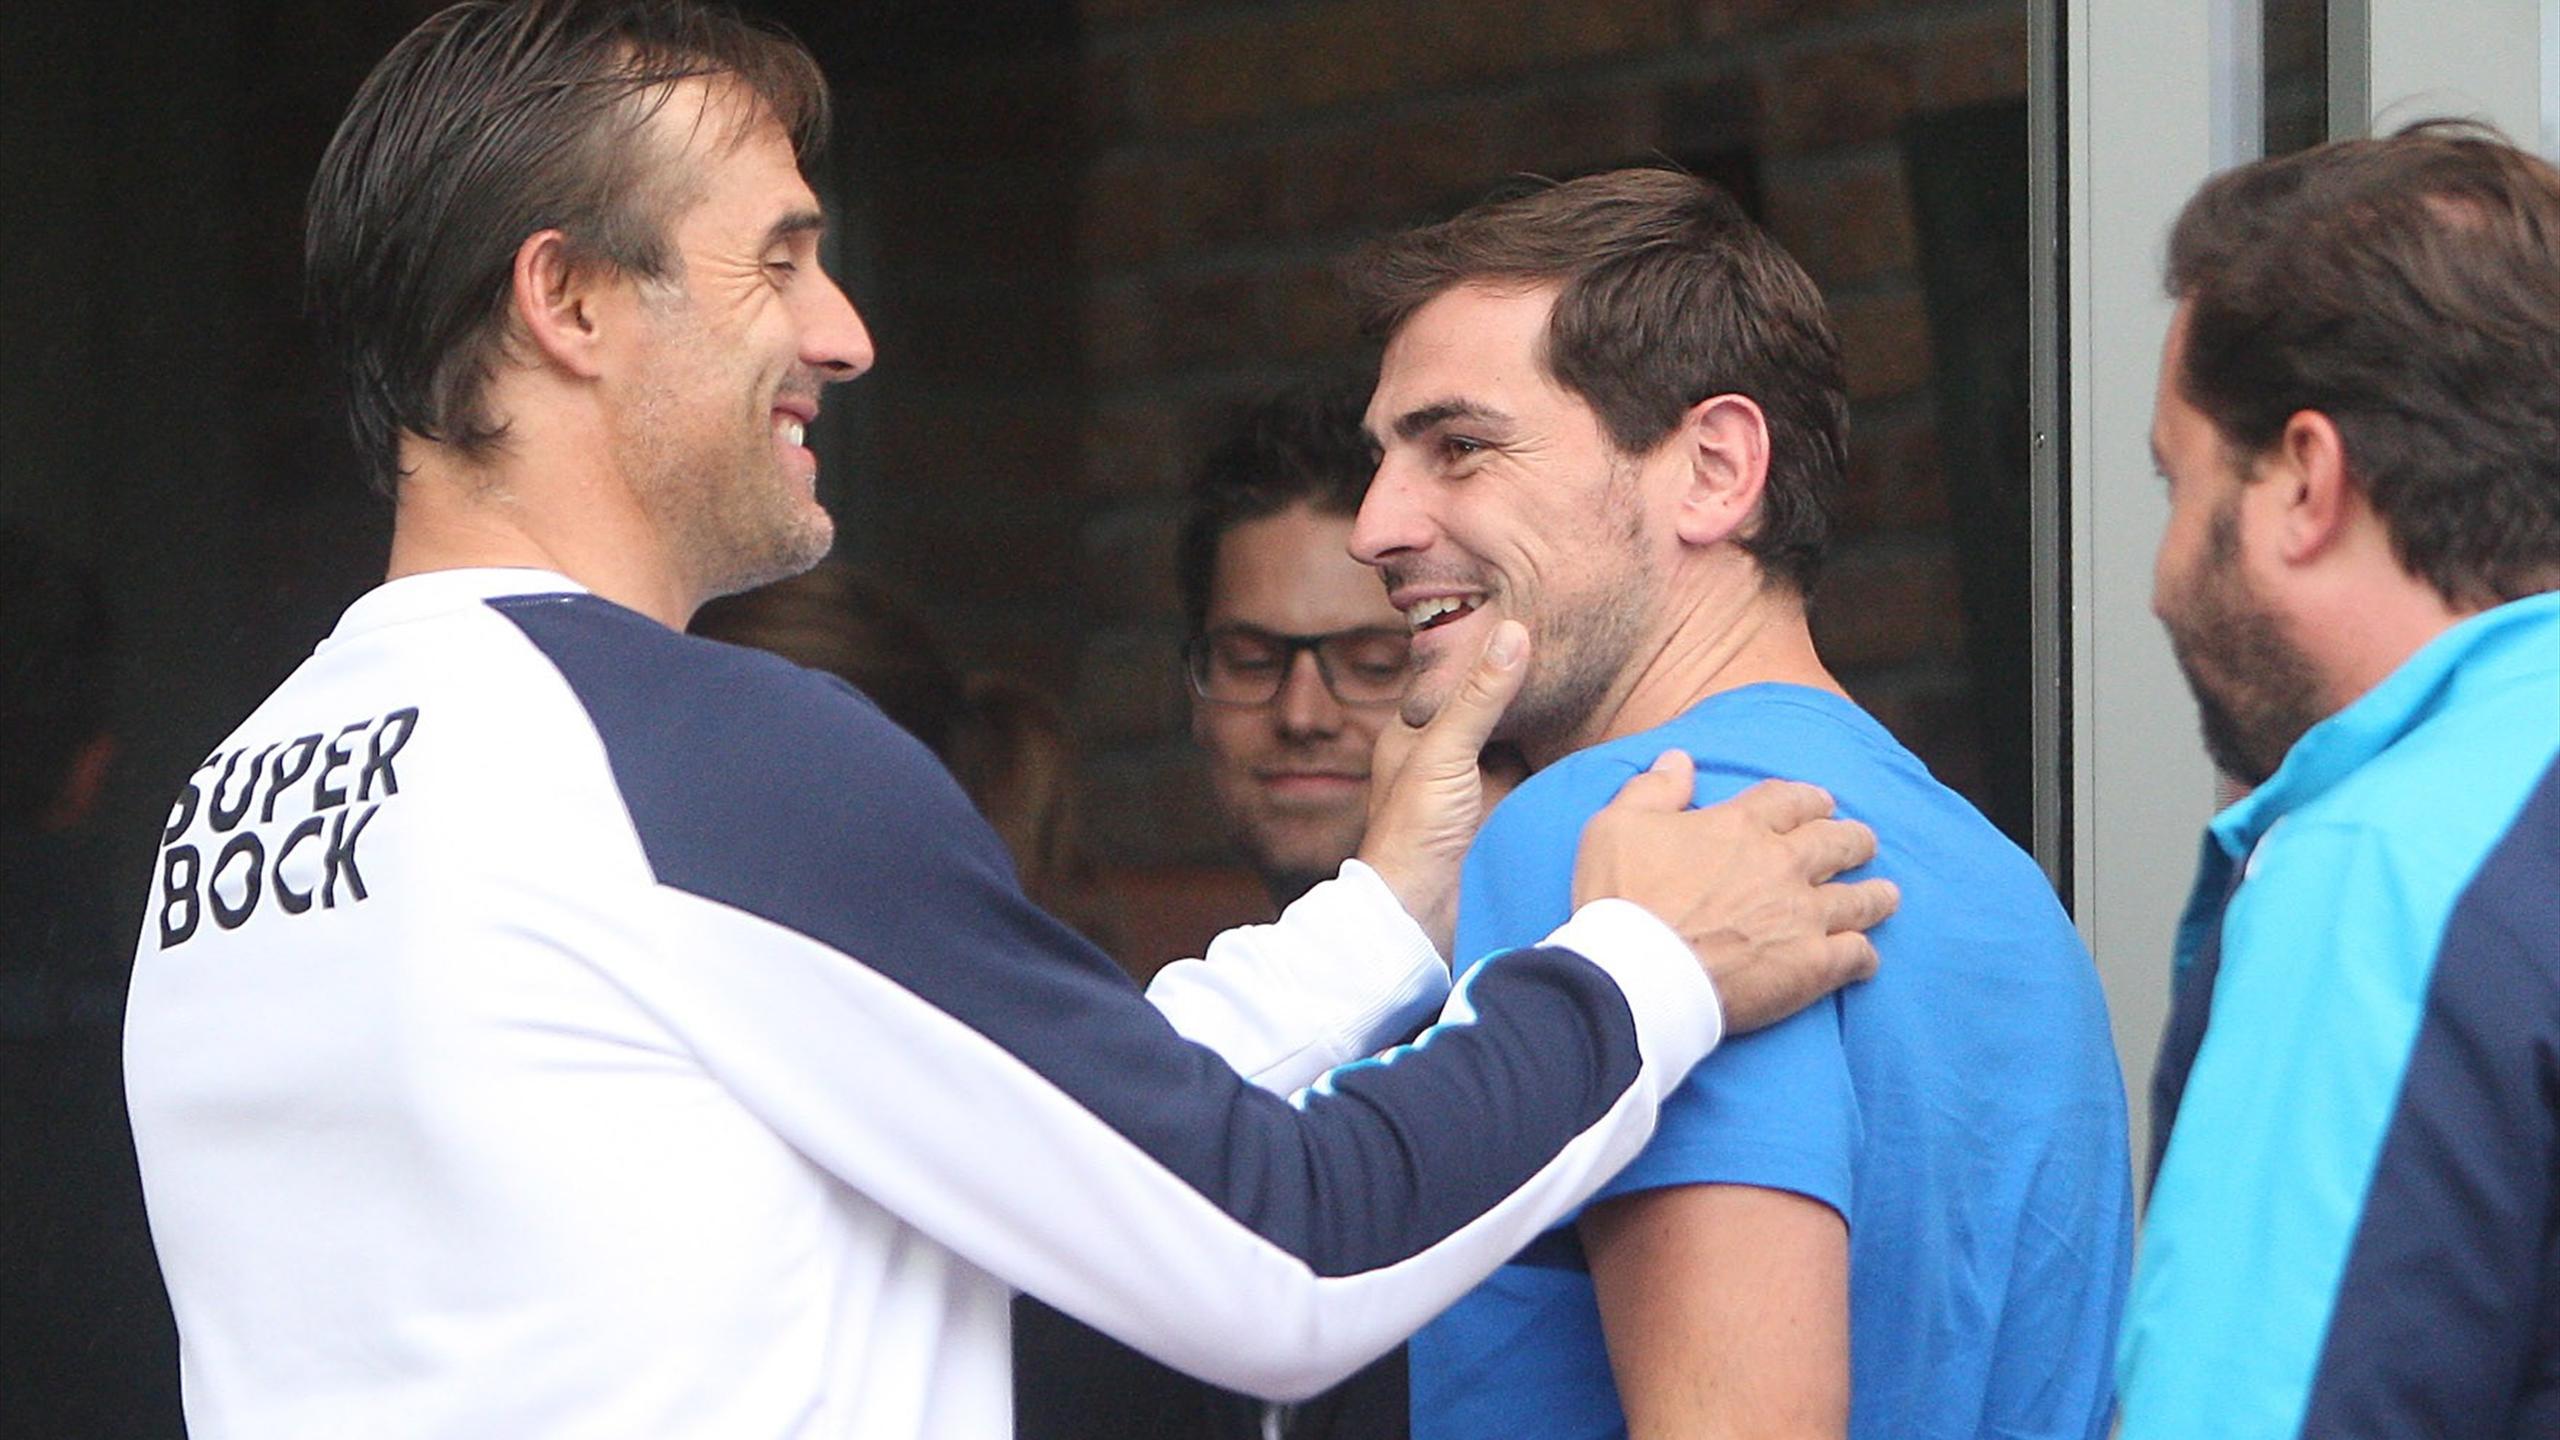 Julen Lopetegui et Iker Casillas ensemble